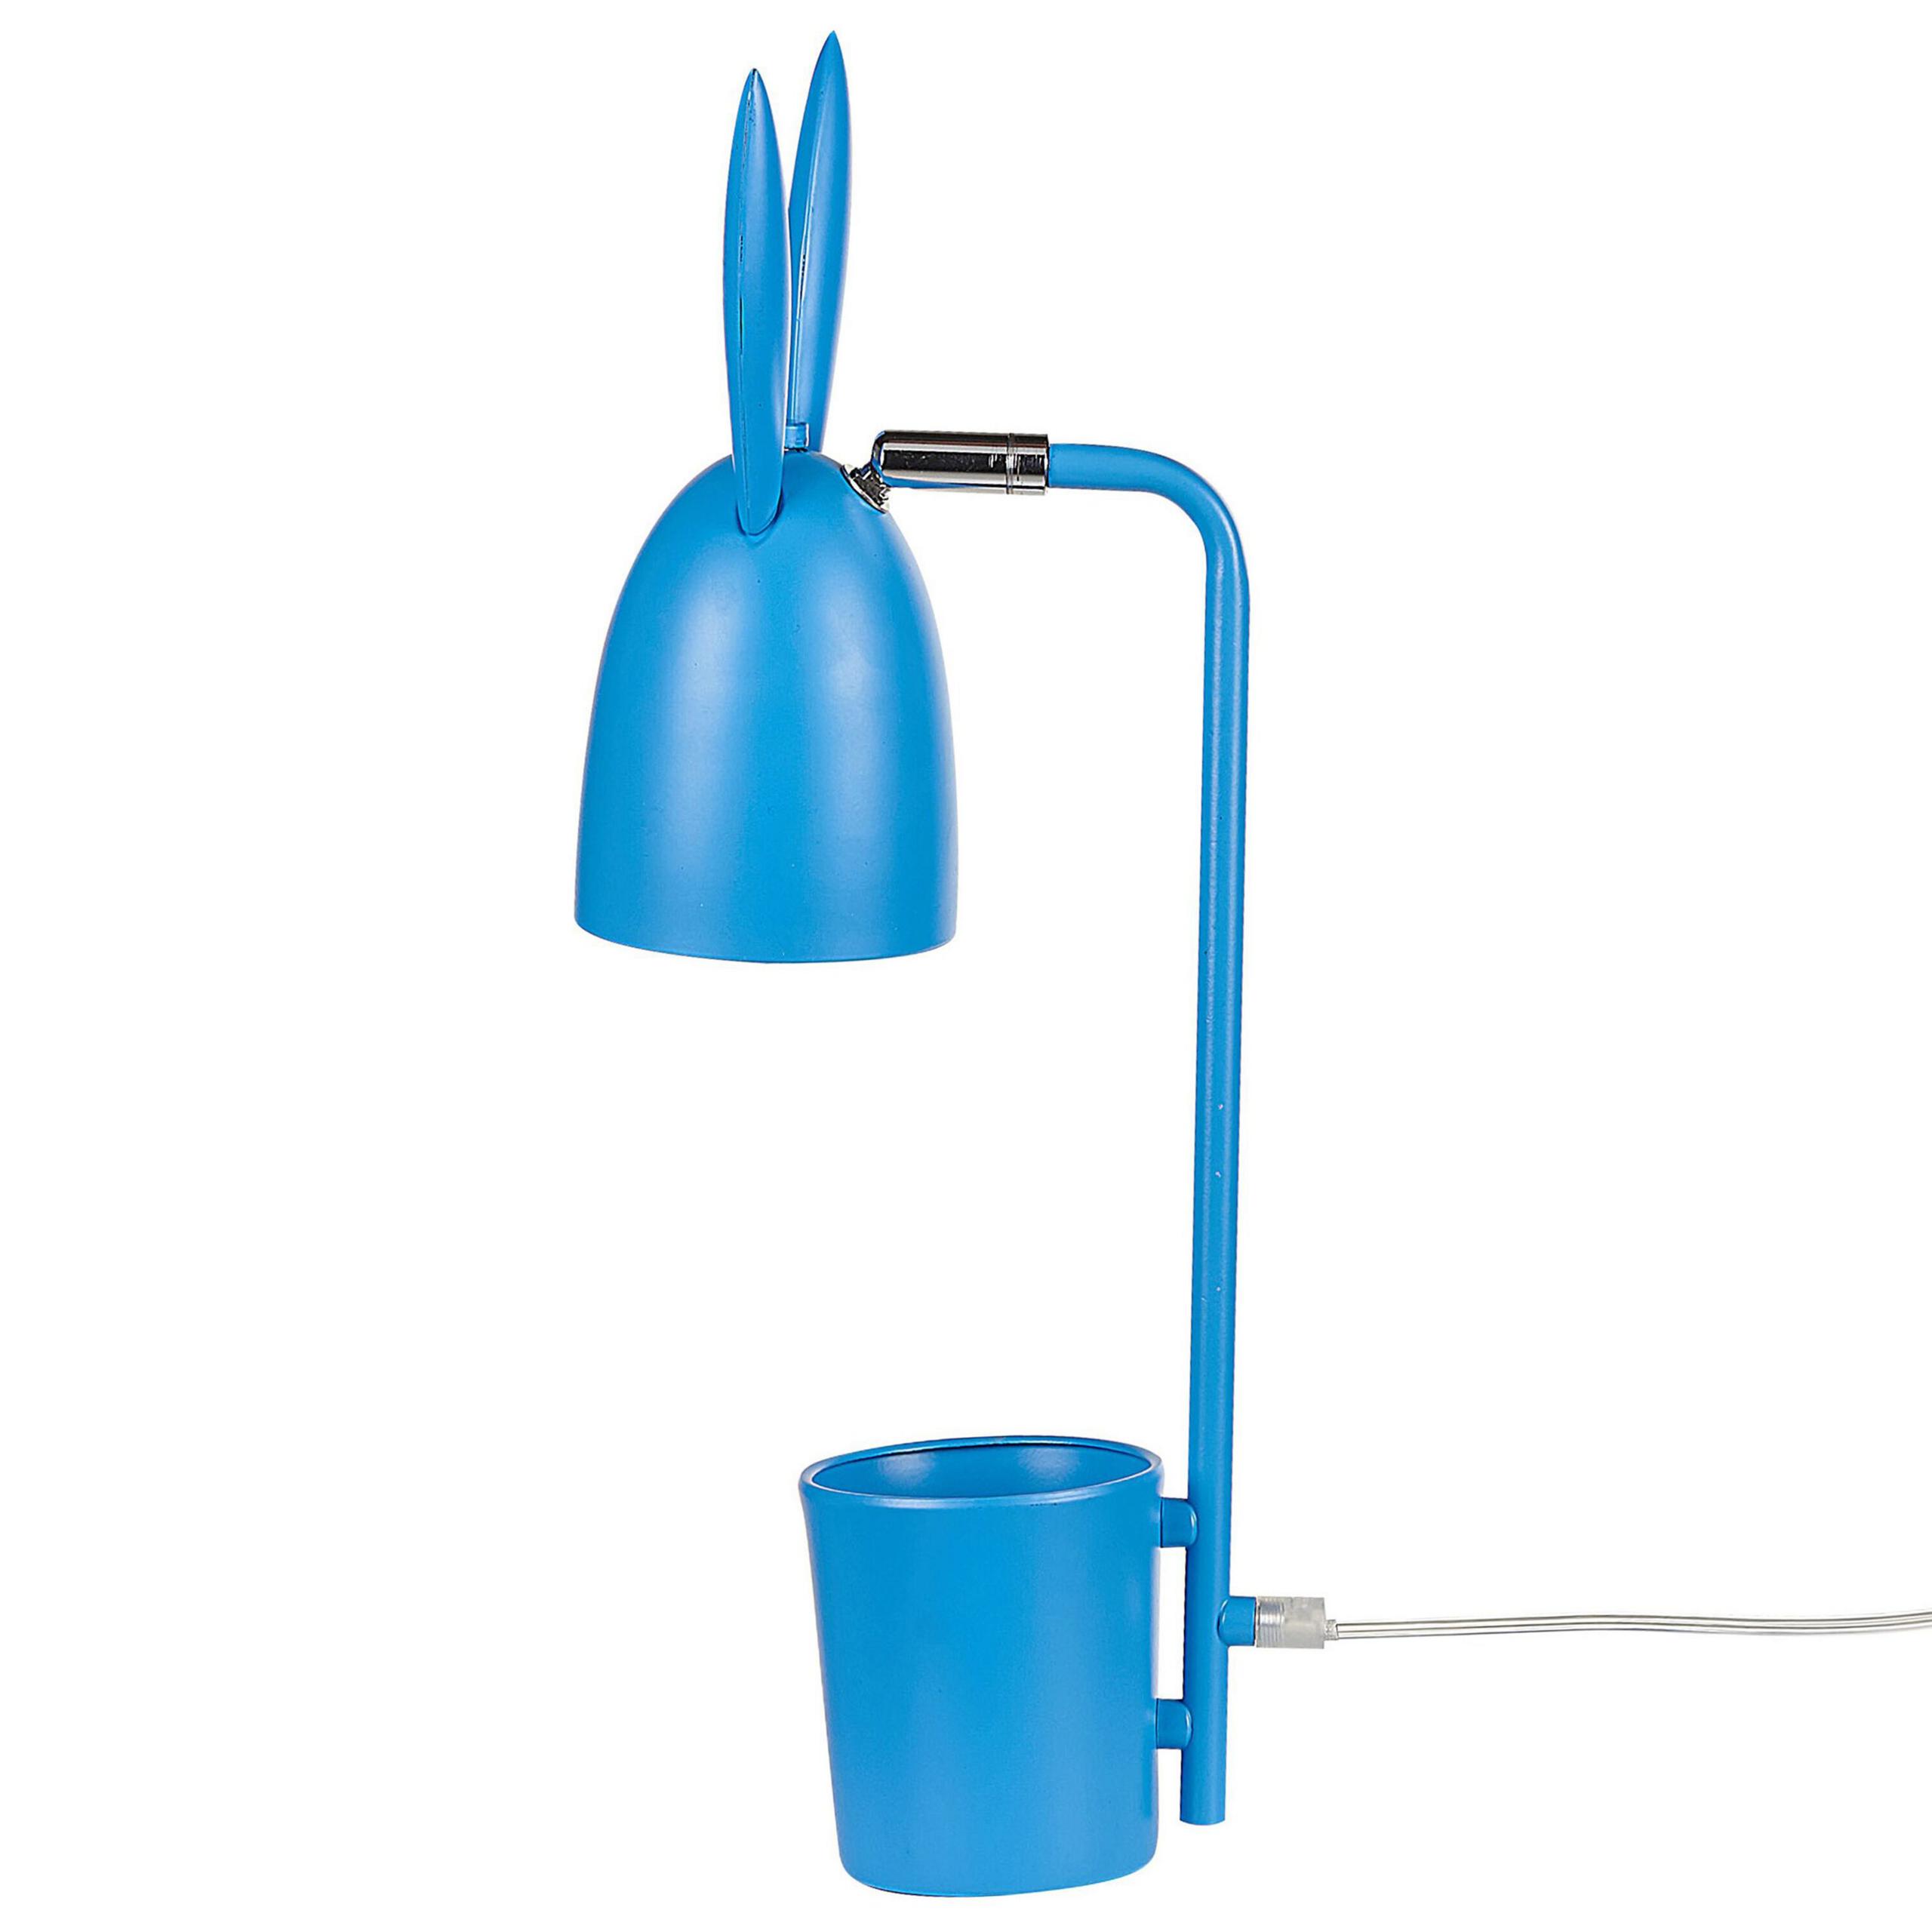 Beliani Desk Lamp Blue Metal Iron 42 cm Table Lamp Bunny Ears Shade Kids Room Modern Design